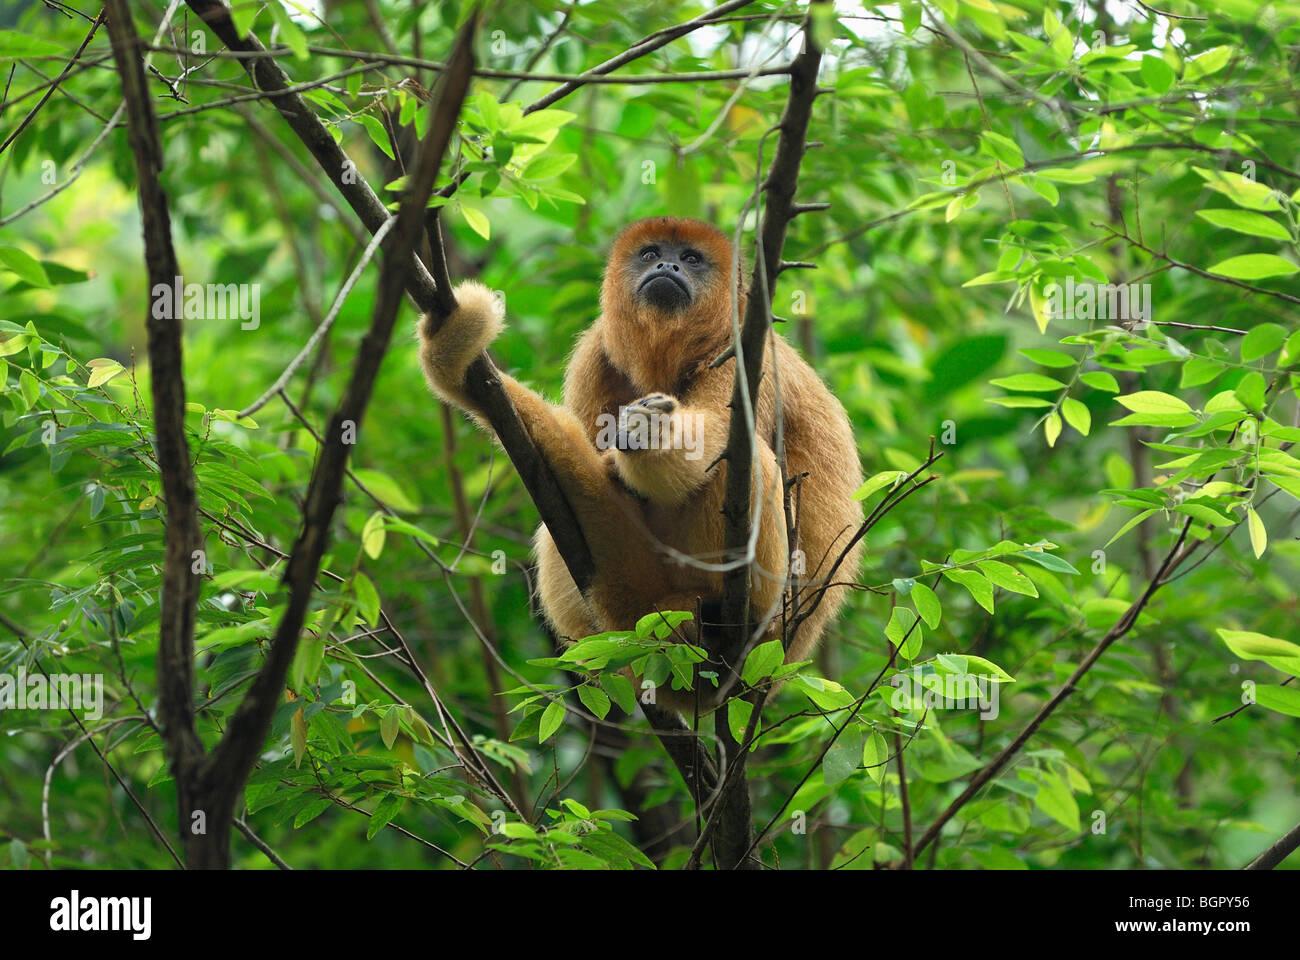 Black-and-Gold Howler Monkey (Alouatta caraya), adult, Brazil - Stock Image